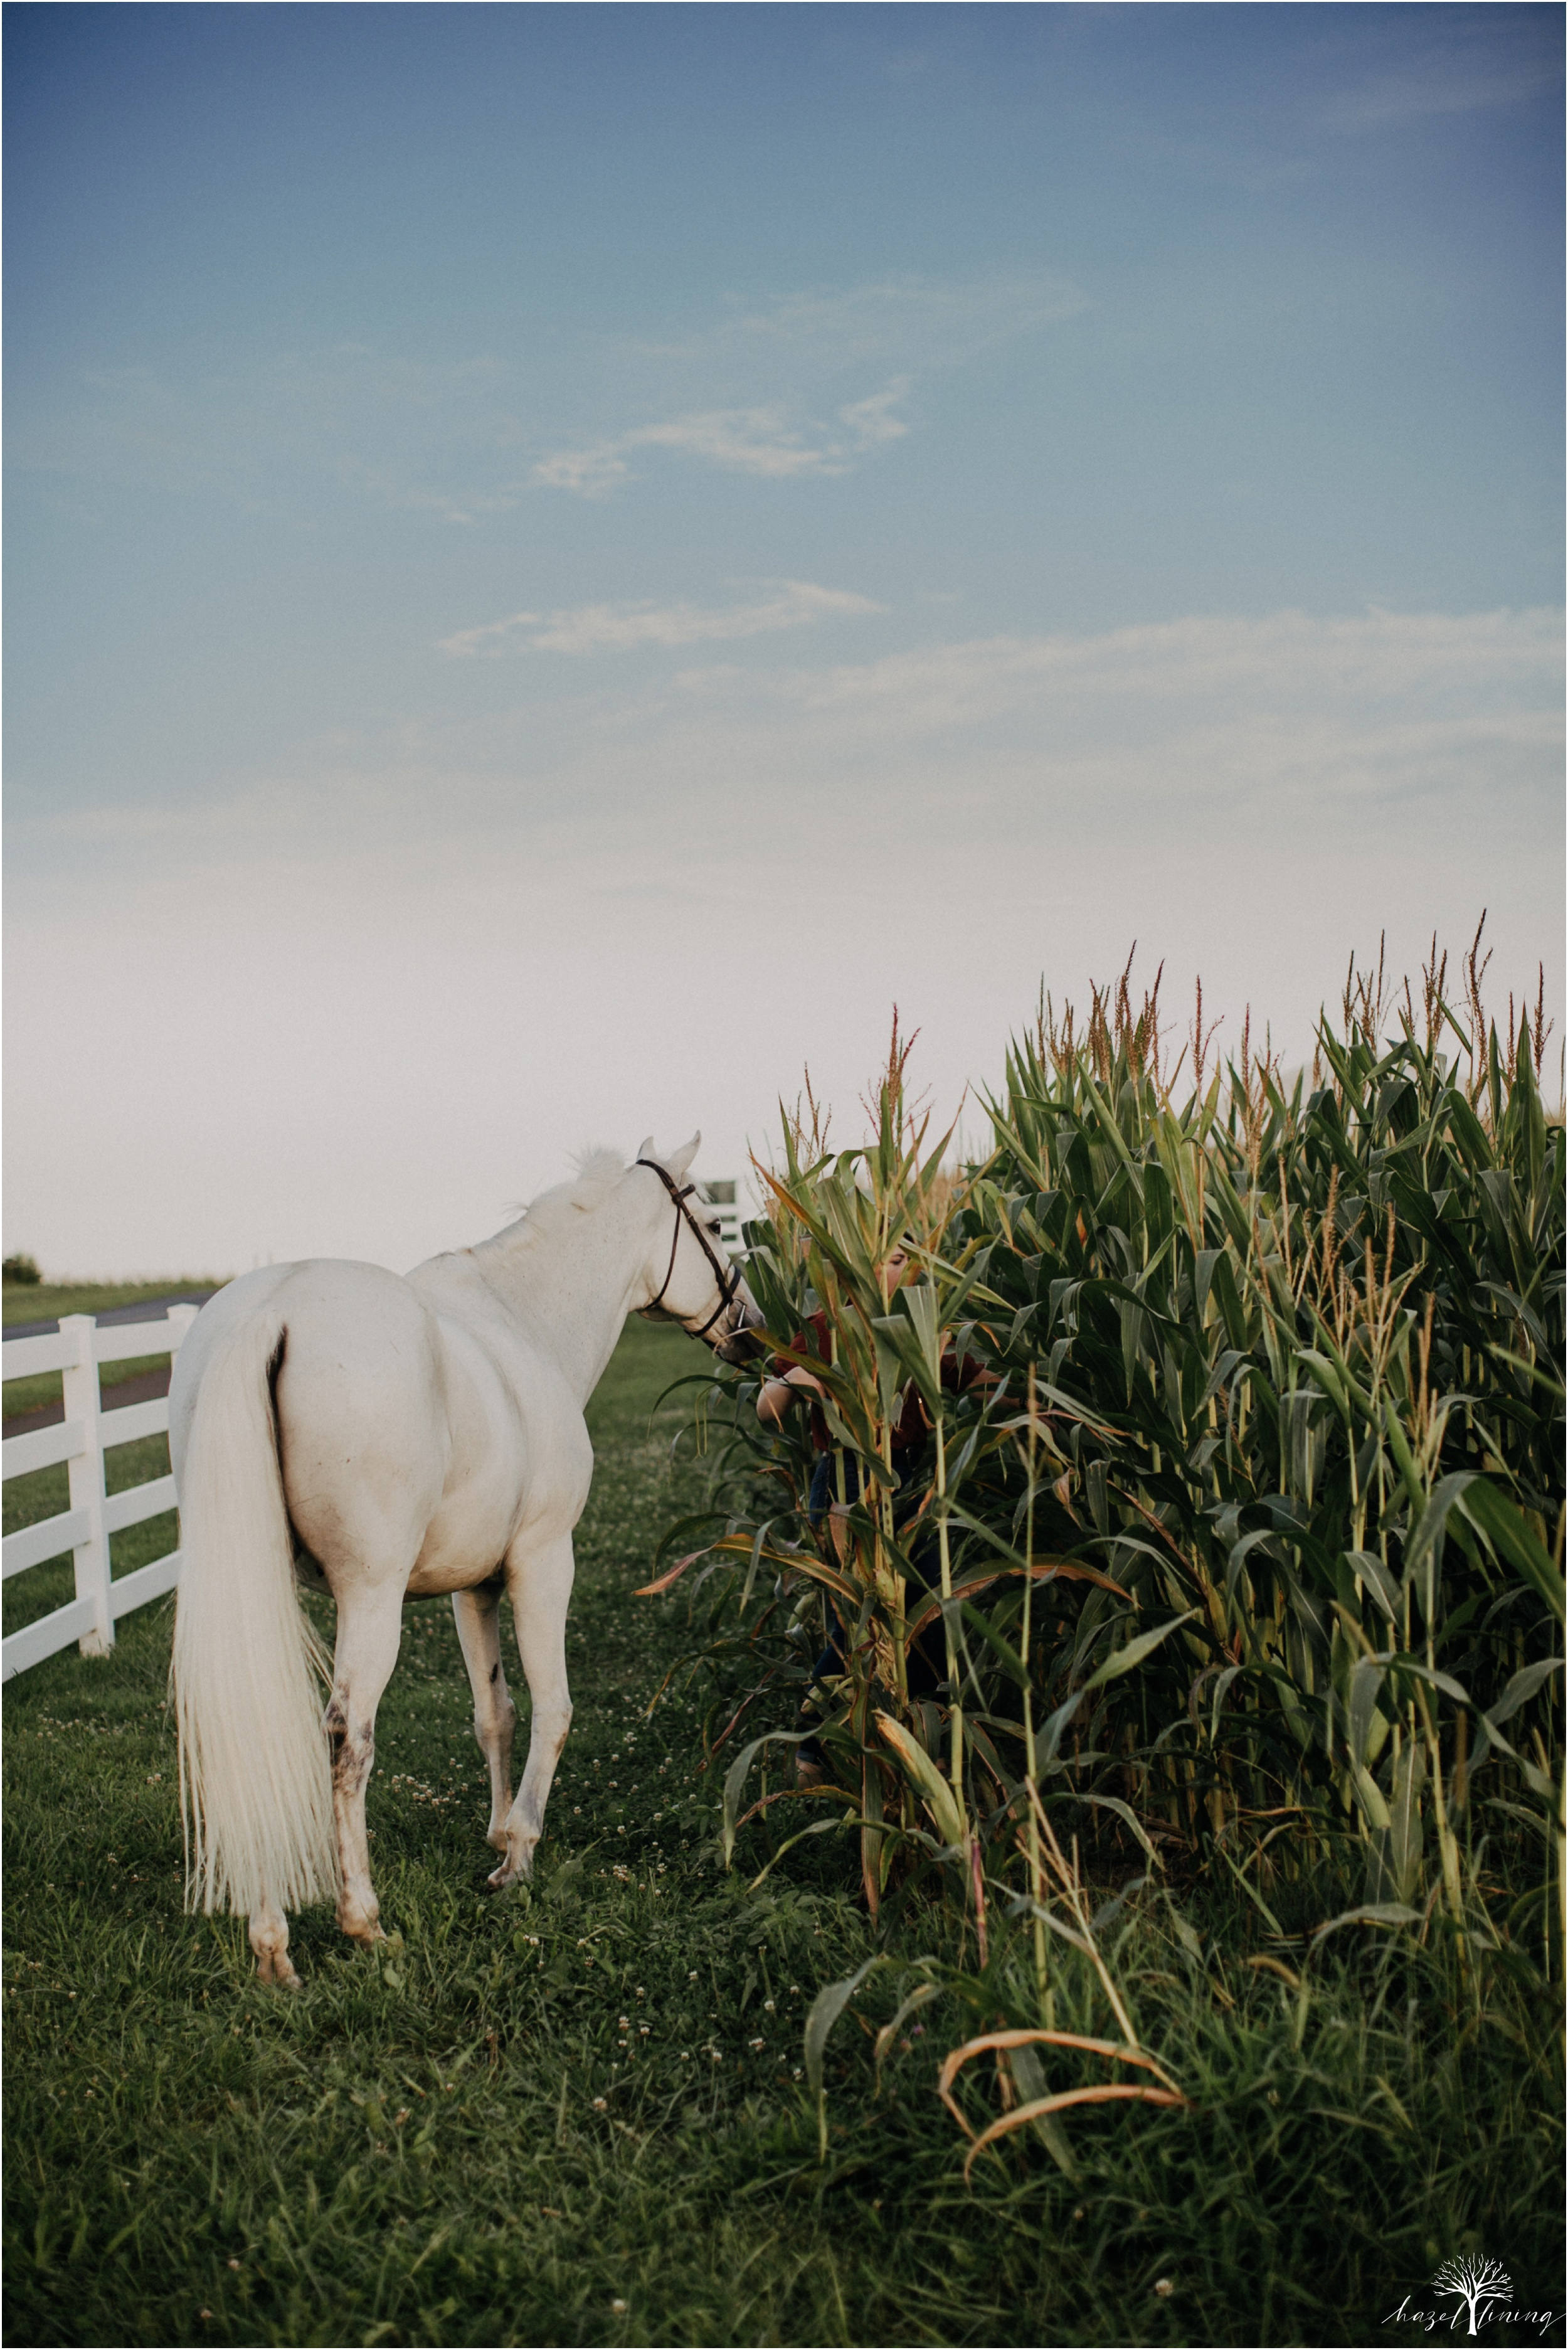 taylor-adams-and-horse-delaware-valley-university-delval-summer-equestrian-portrait-session-hazel-lining-photography-destination-elopement-wedding-engagement-photography_0027.jpg